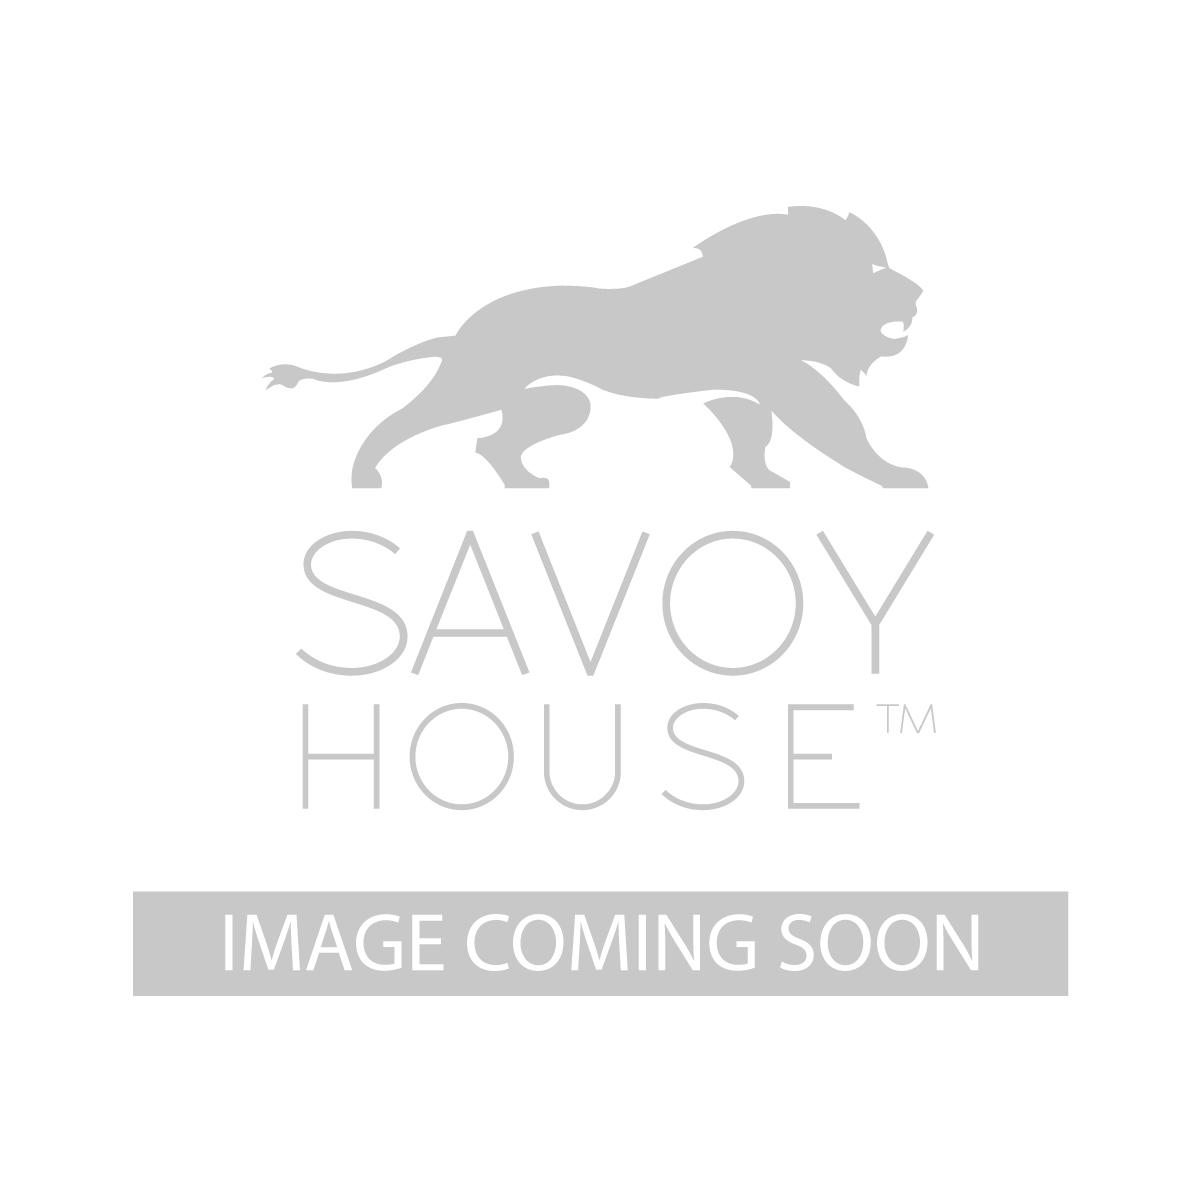 Linden 7  Wall Lantern  sc 1 st  Savoy House & 5-9590-BK Linden 7-inch Wall Lantern by Savoy House